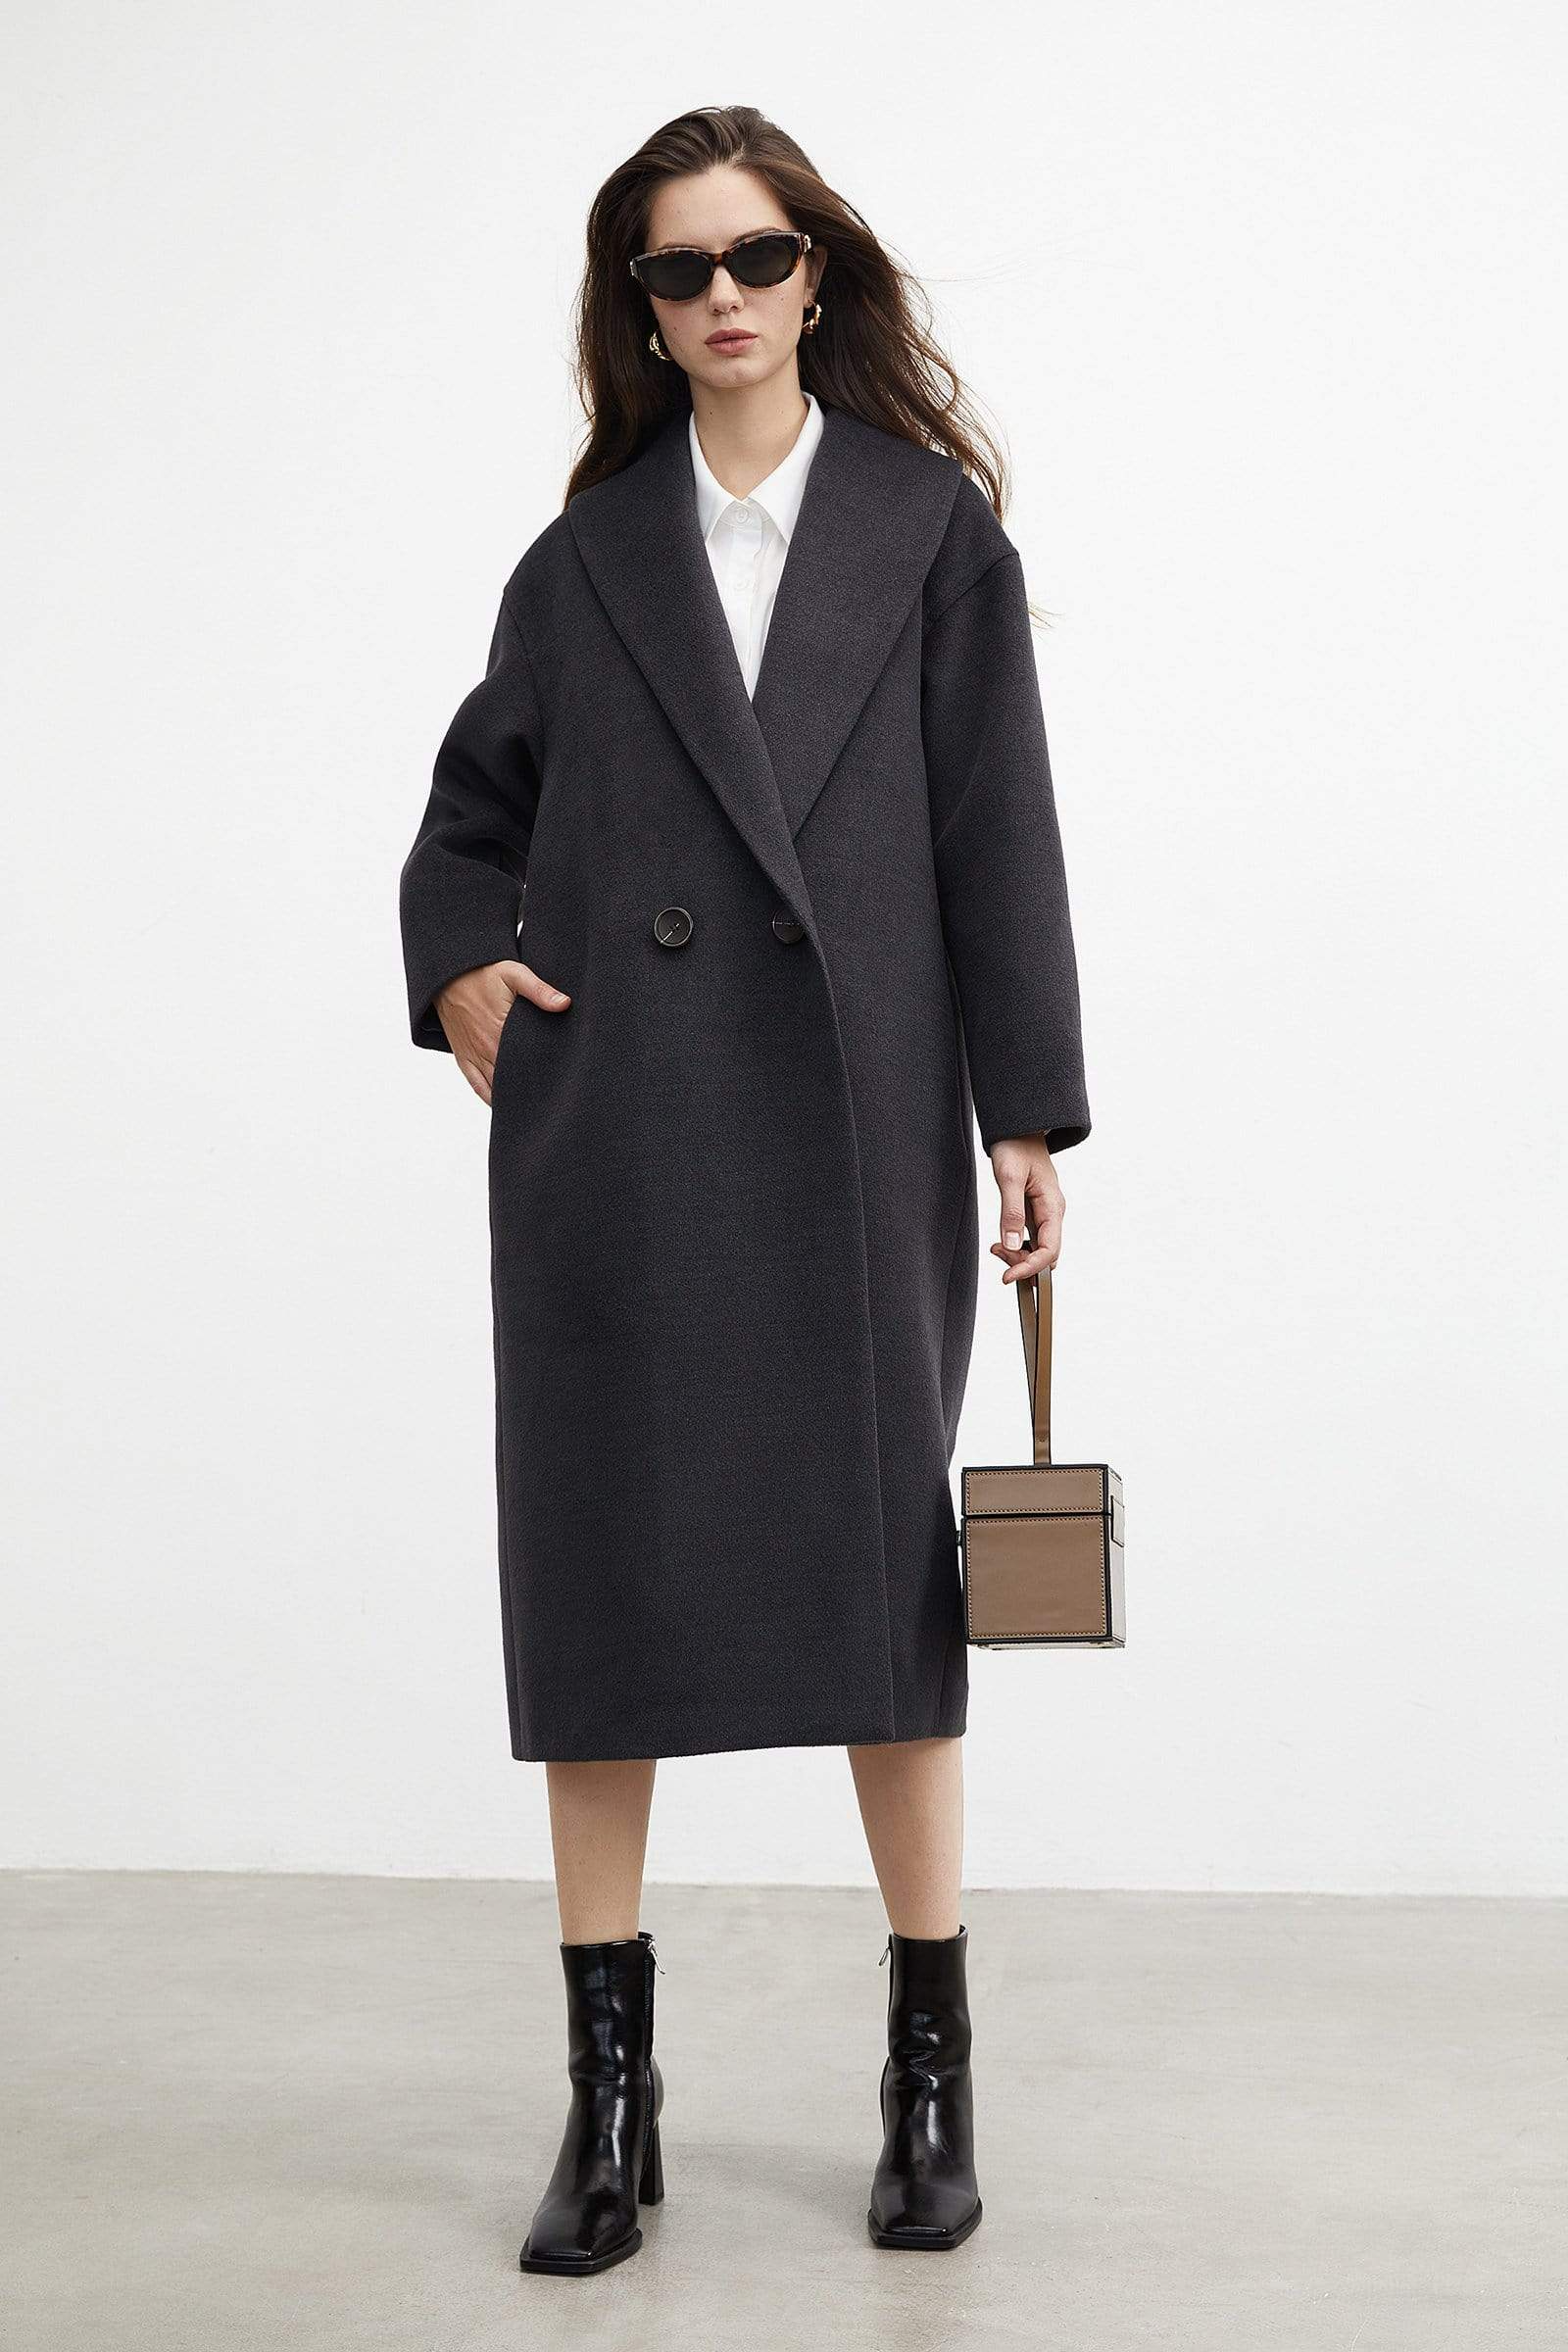 Isodora Black Panel Denim Jacket by J.ING Women's Apparel